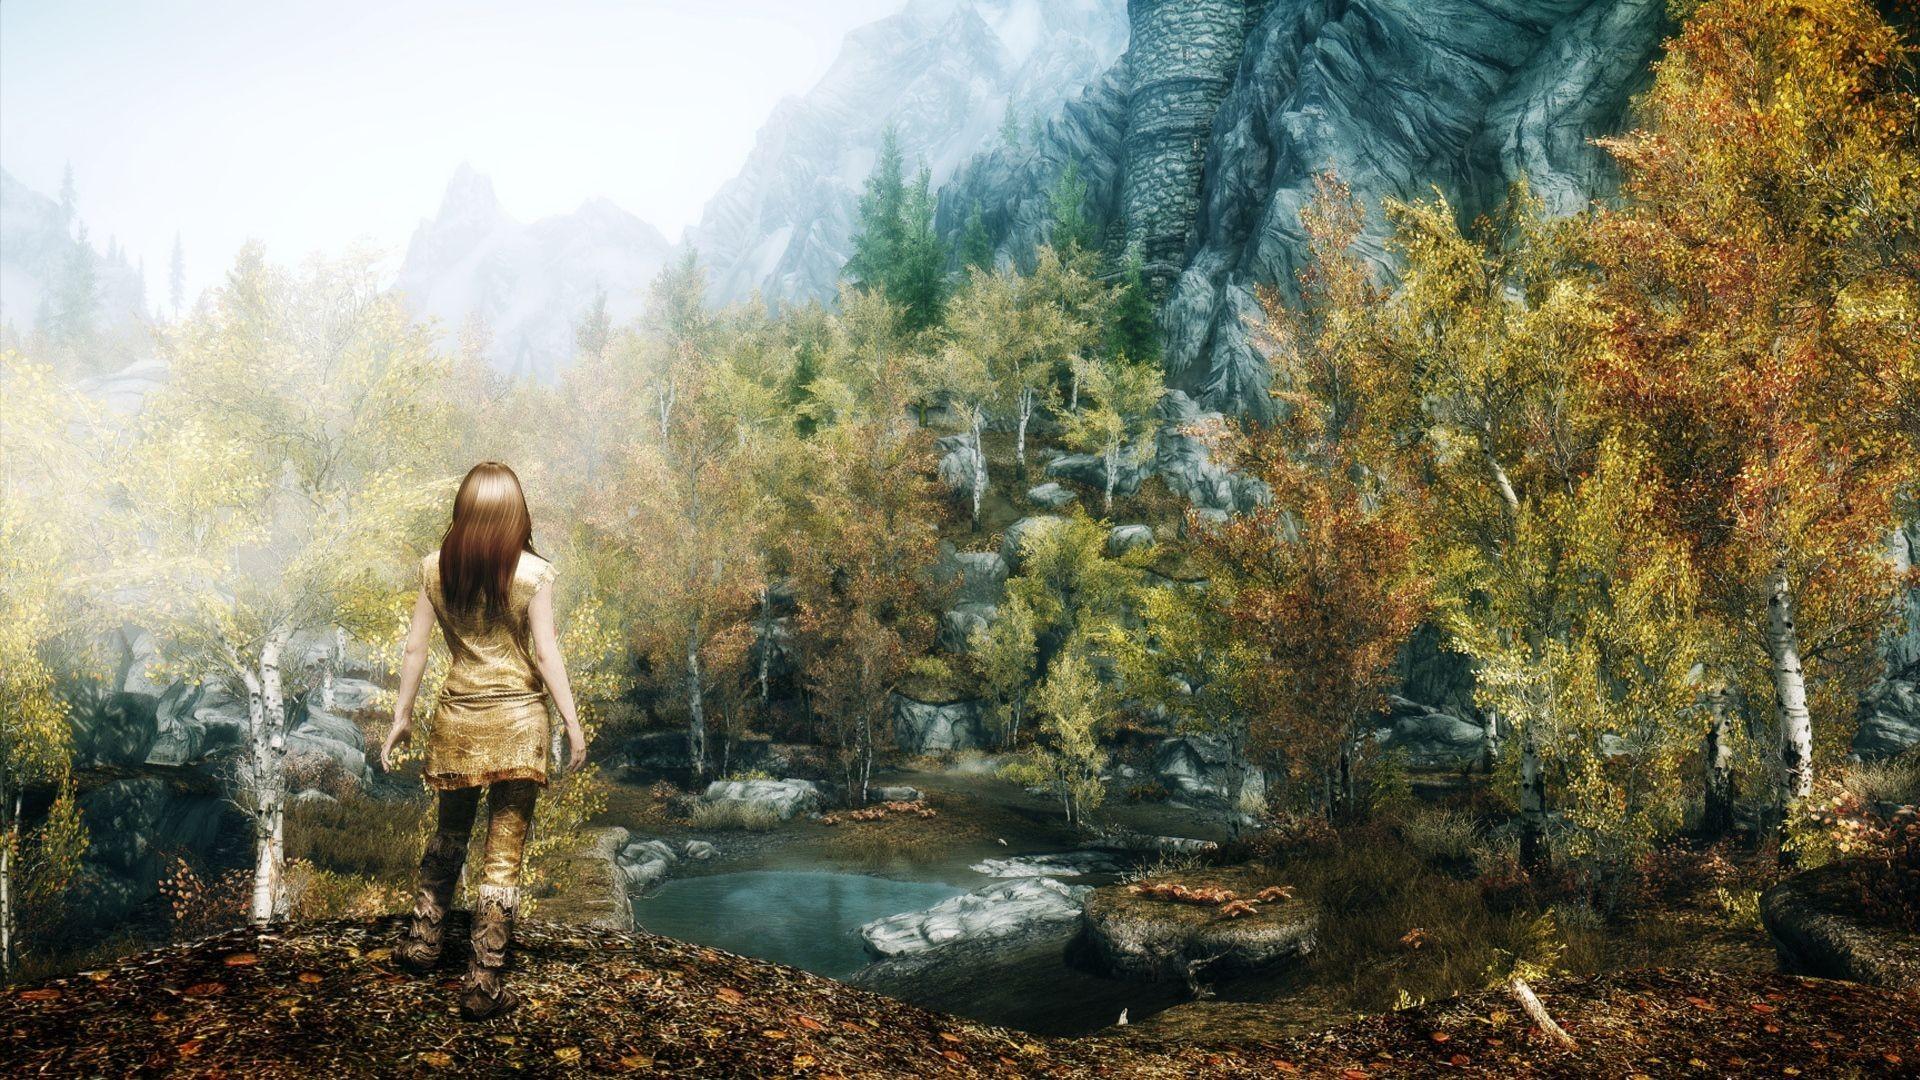 Download Wallpaper Skyrim, Girl, Autumn, Trees Full HD .